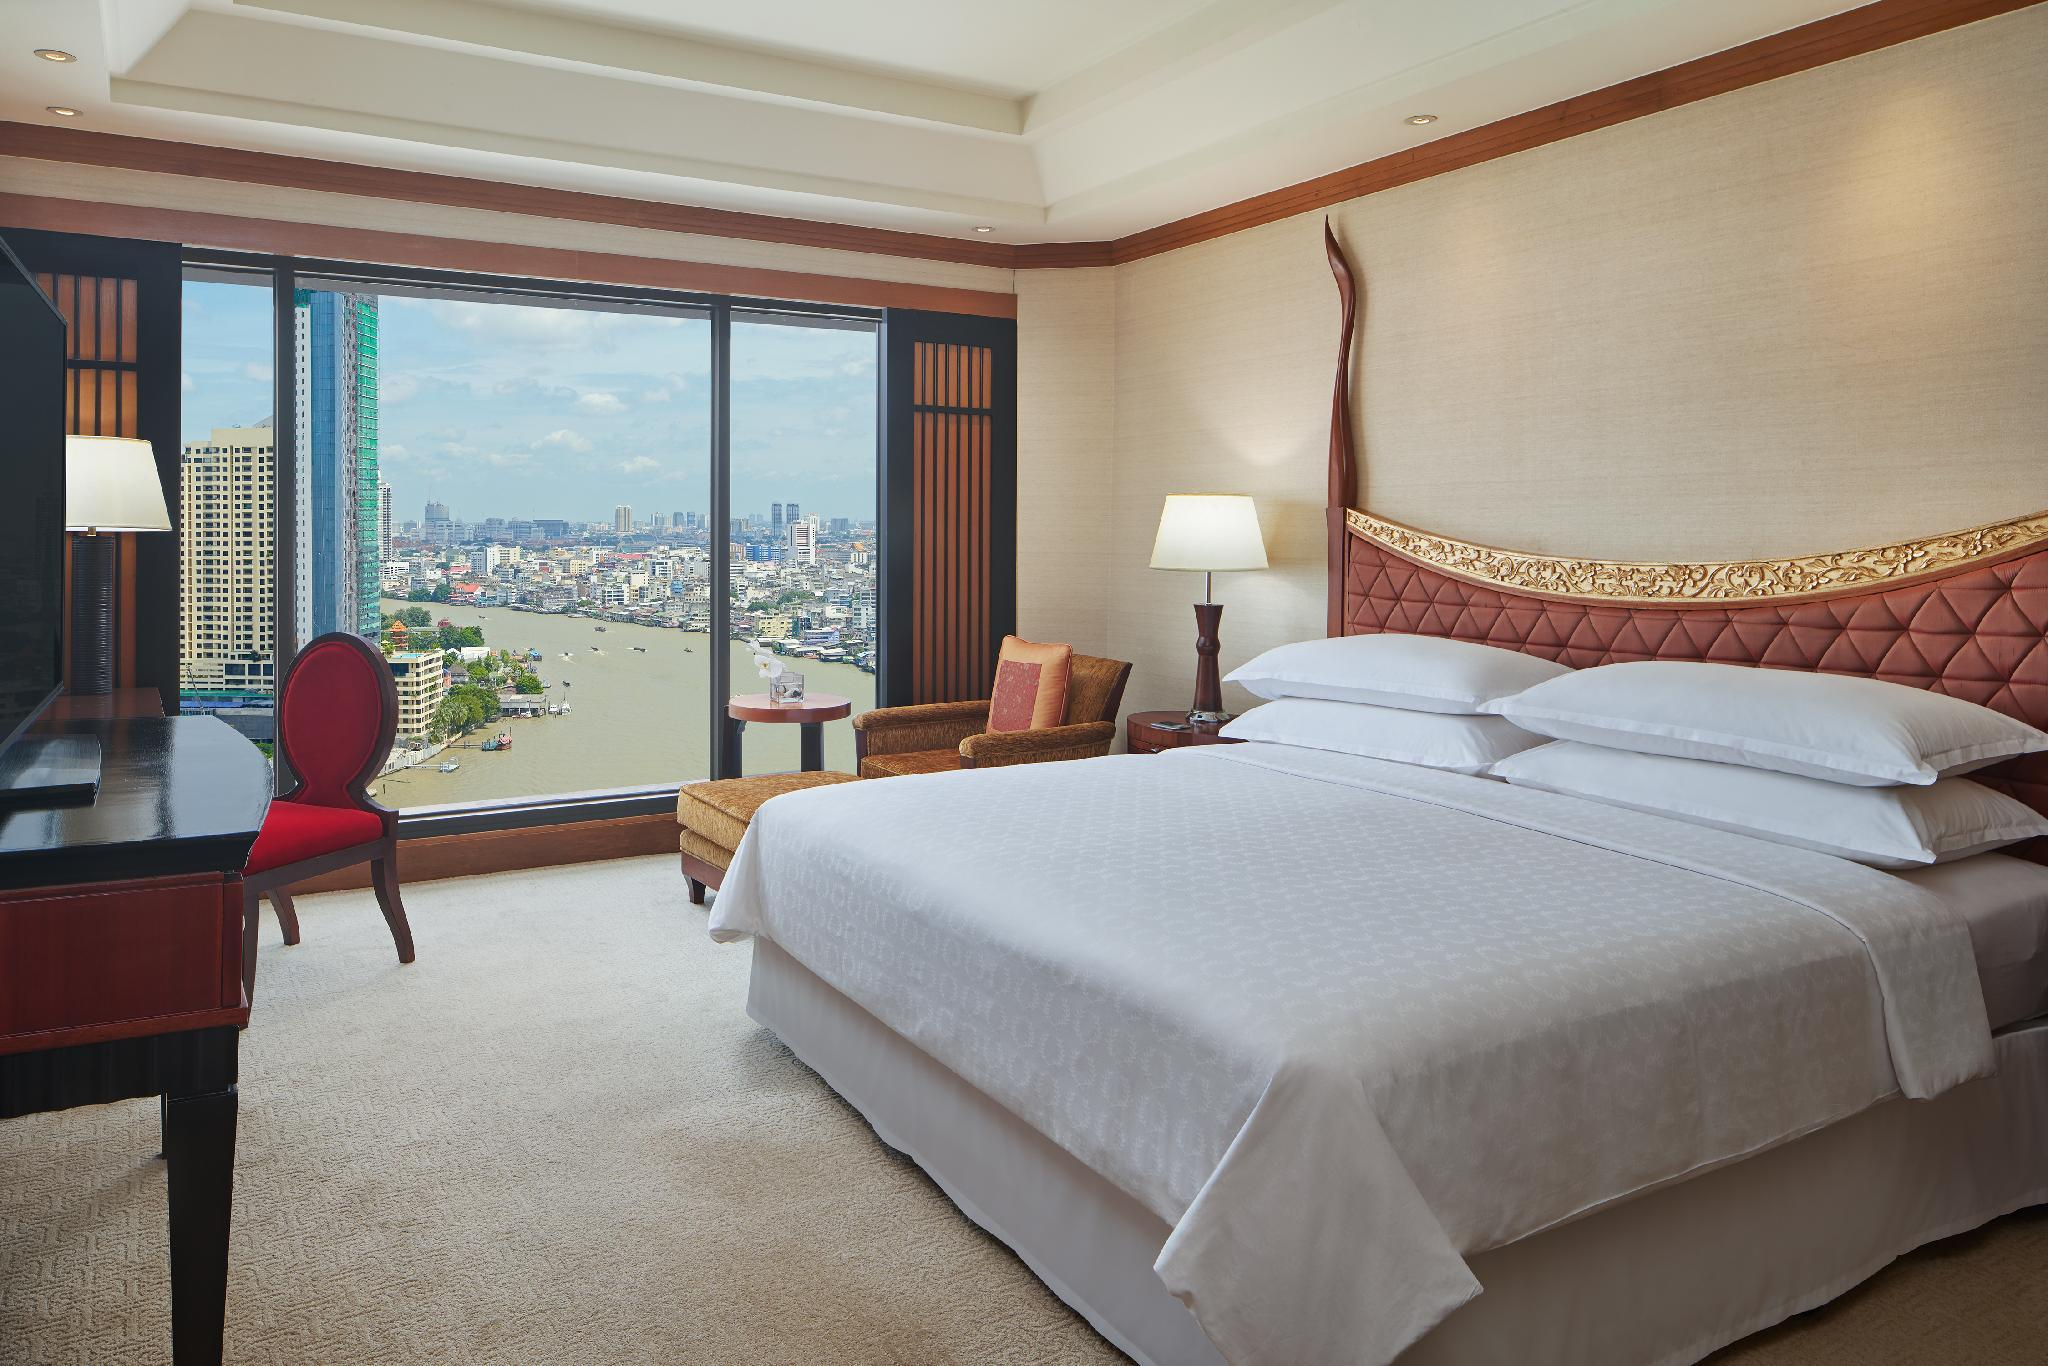 Royal Orchid Sheraton Hotel & Towers โรงแรม รอยัล ออคิด เชอราตัน